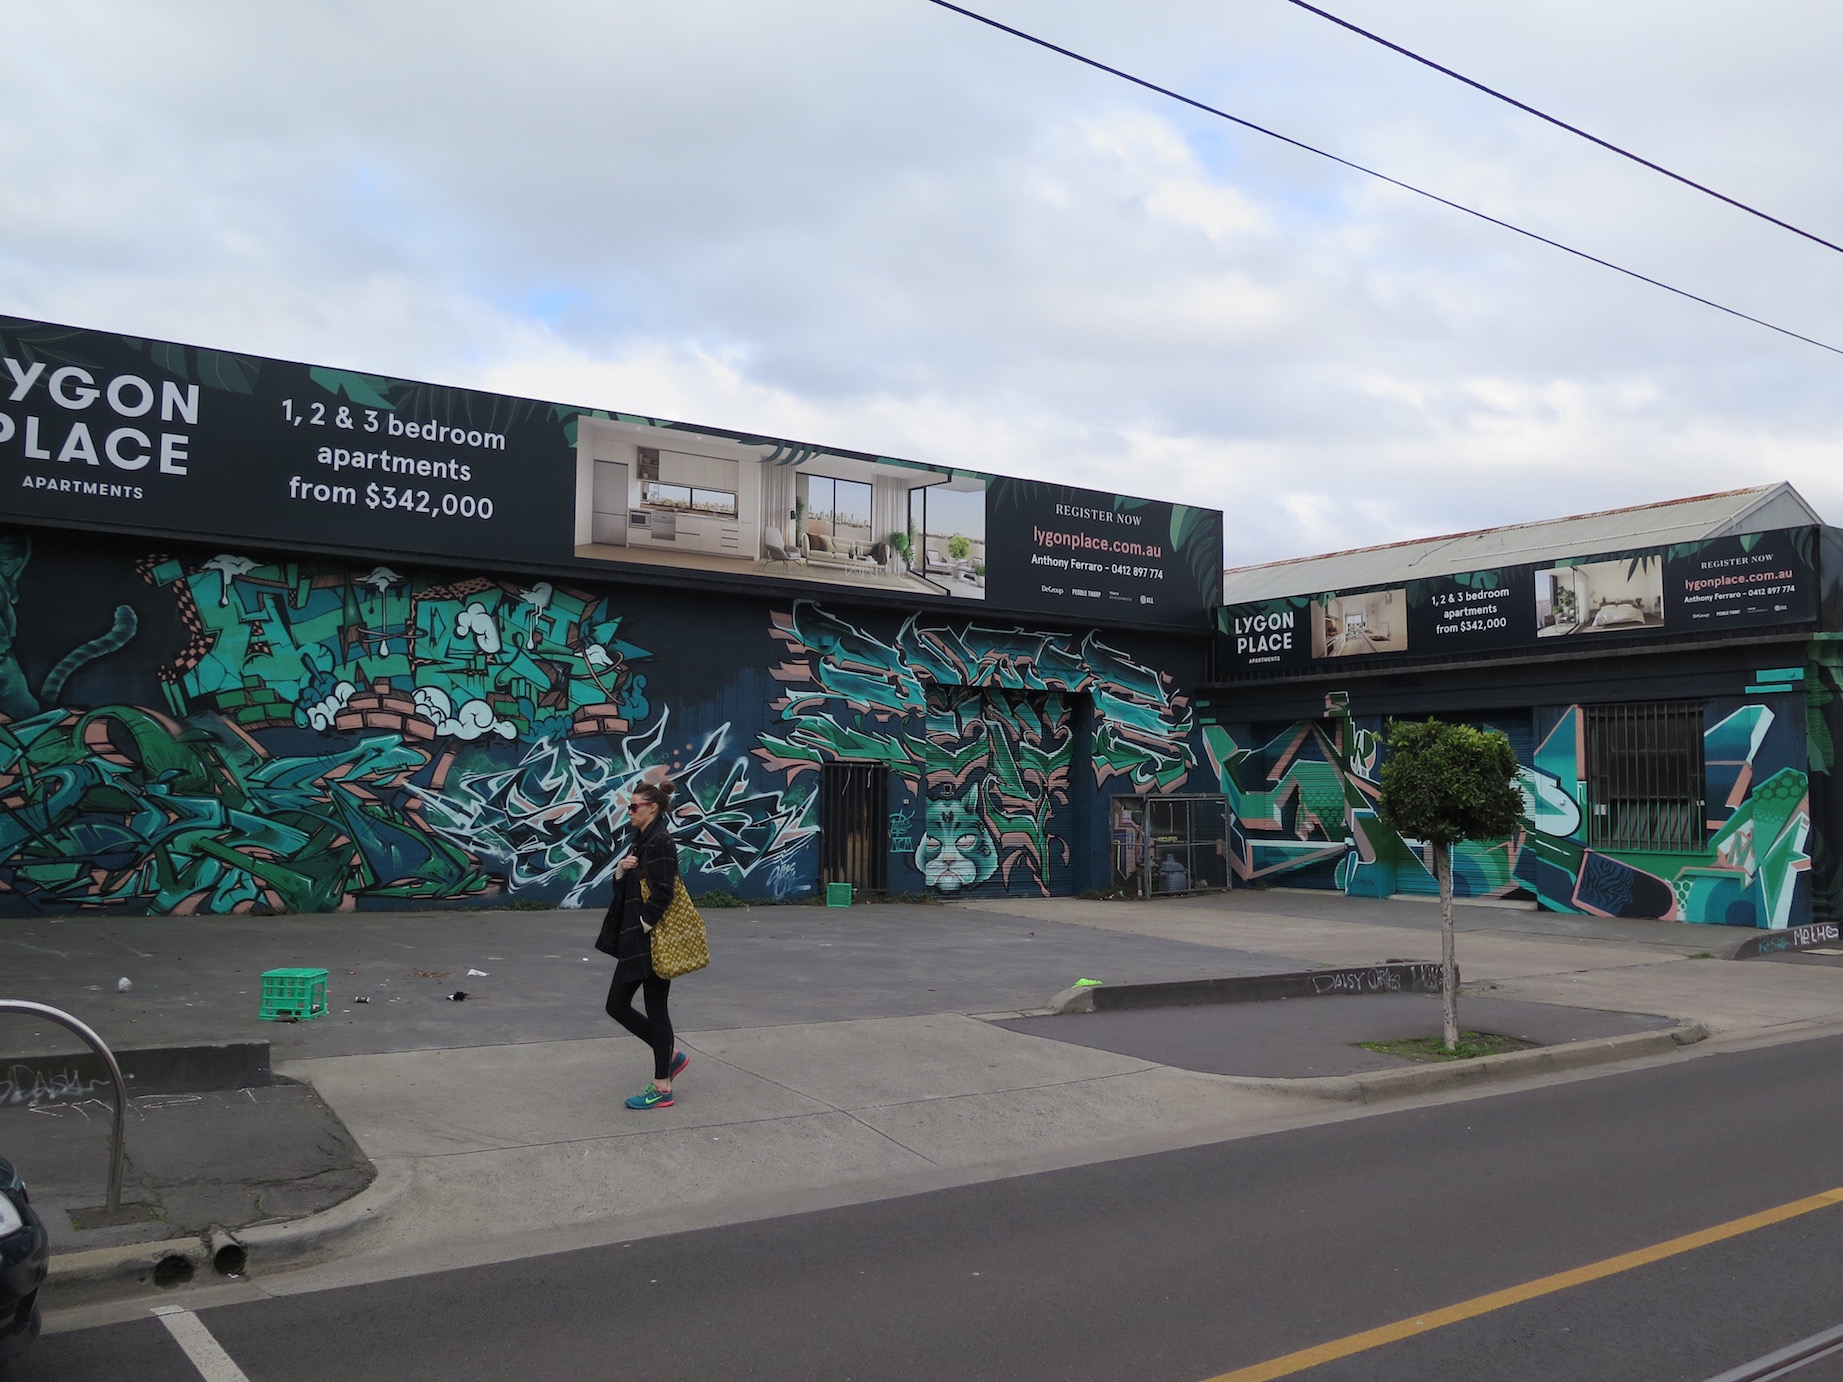 deansunshine_landofsunshine_melbourne_streetart_graffiti_lygon place graff takeover 4